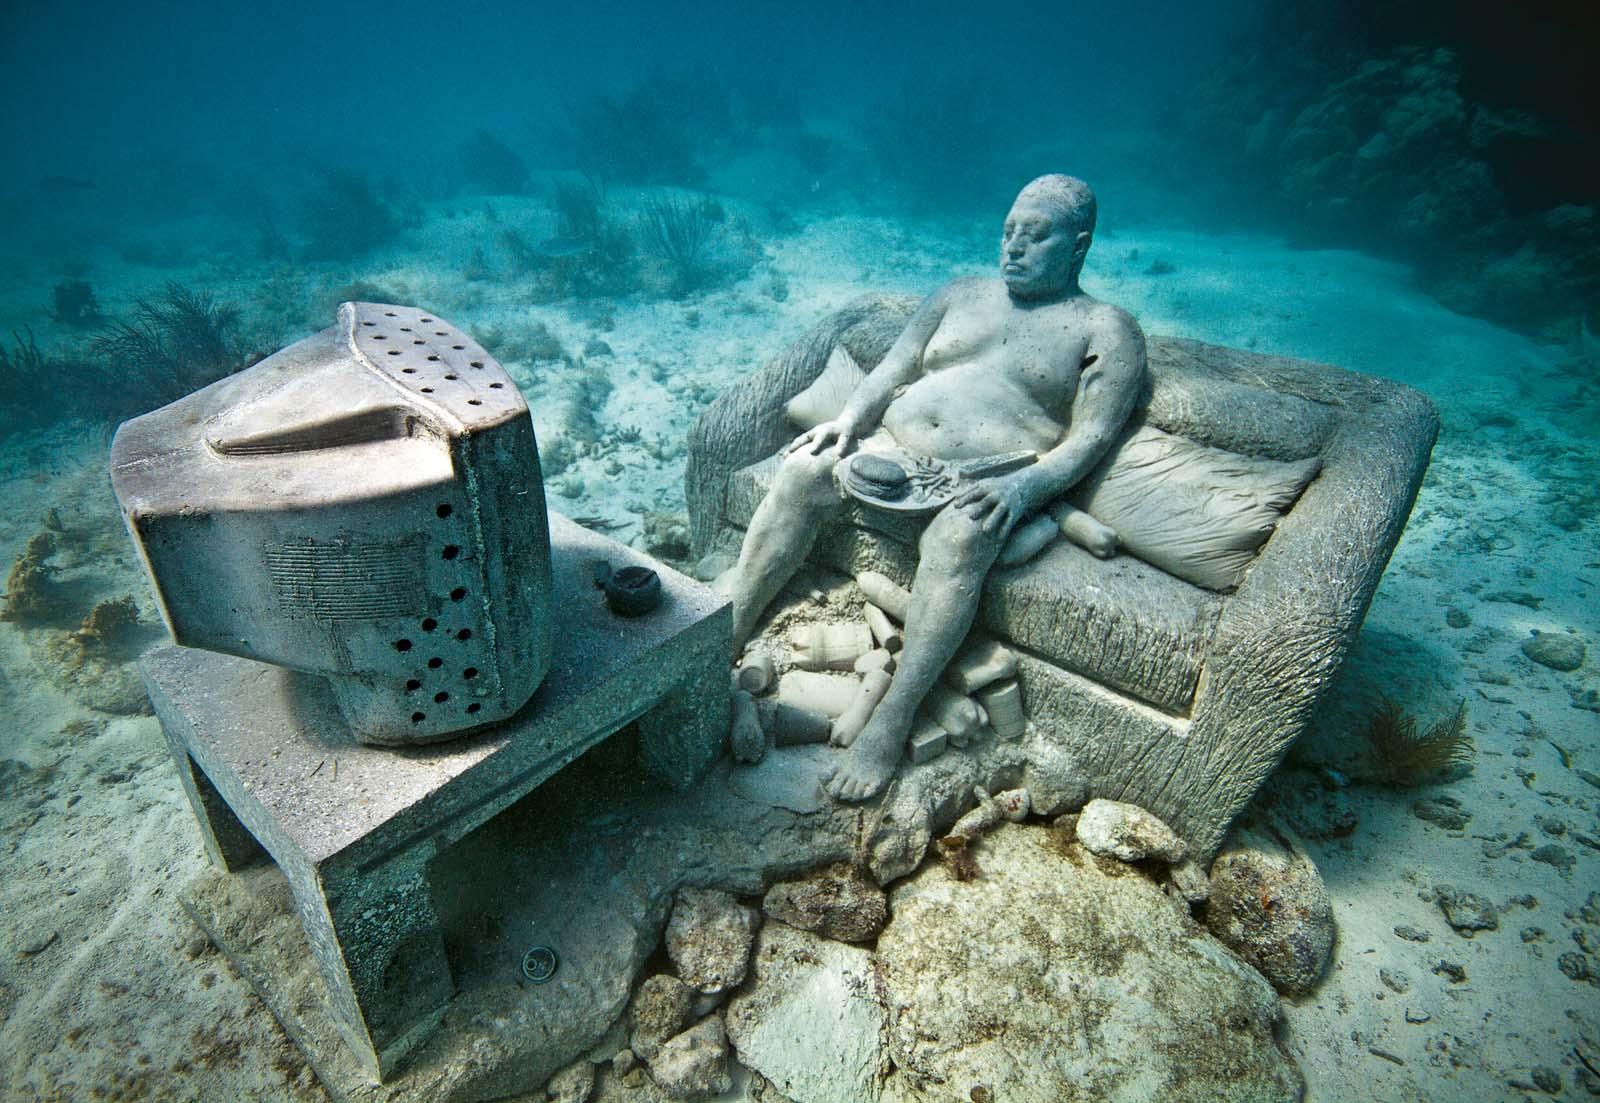 Подводный музей, Мексика. Фигура домохозяина на диване с гамургером перед телевизором.